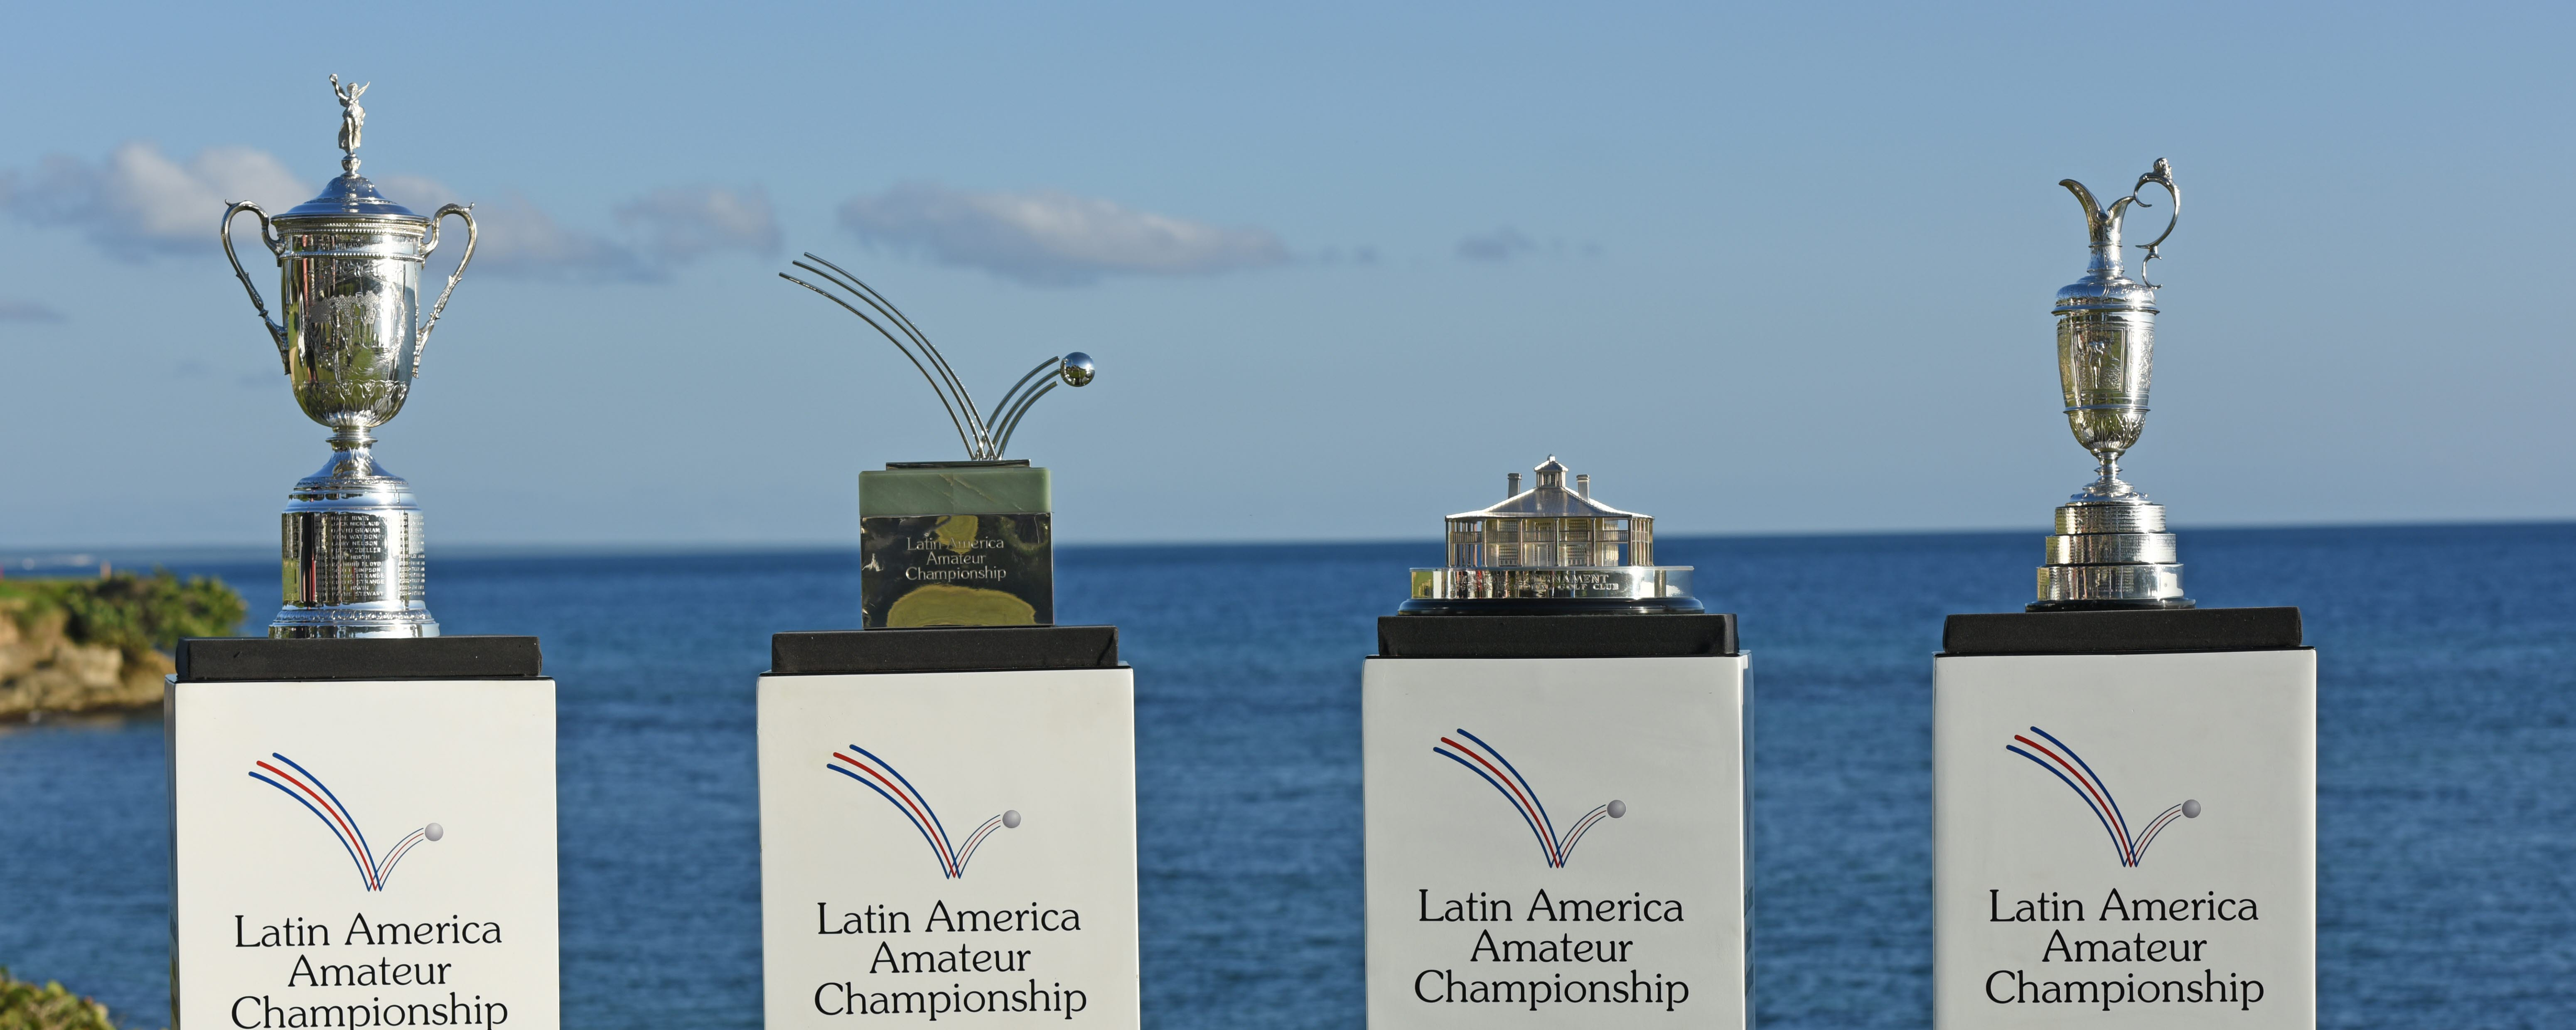 El Latin America Amateur Championship regresa a Casa de Campo en República Dominicana en 2022